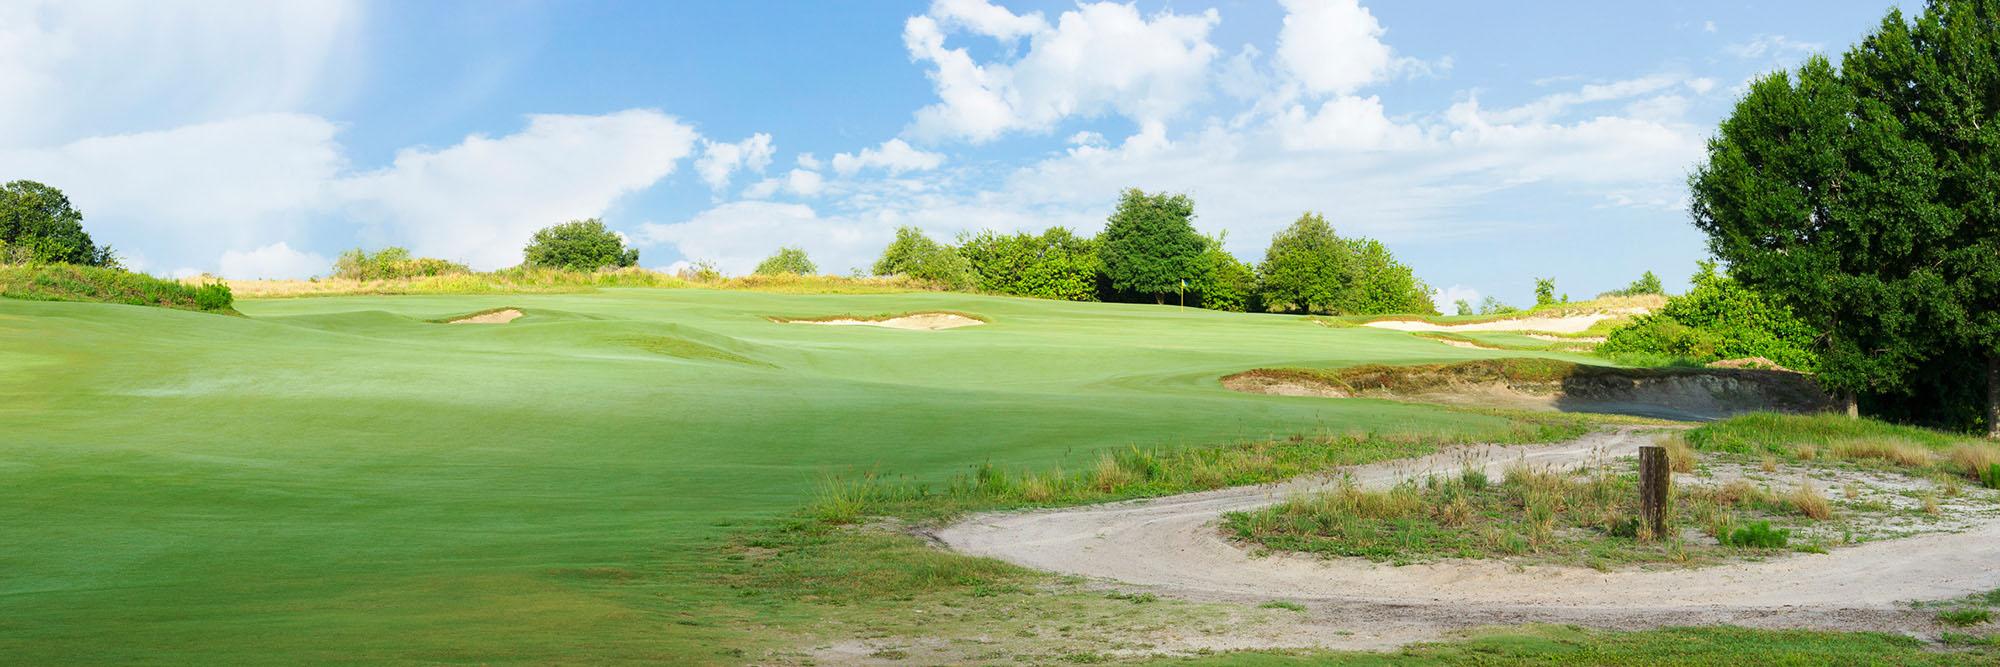 Golf Course Image - Streamsong Blue No. 16